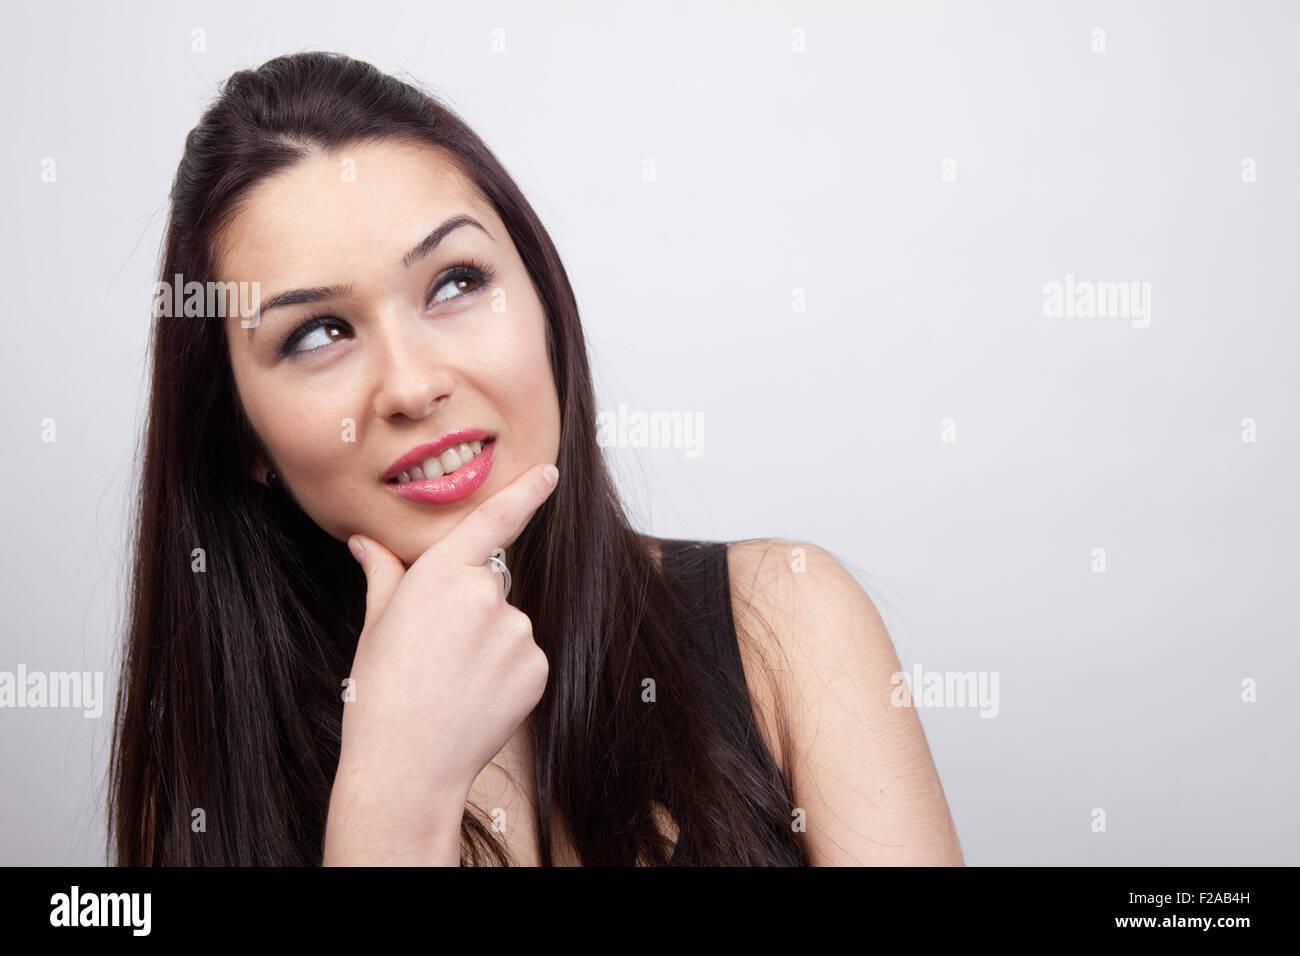 Creative pensive cute woman having an idea - Stock Image